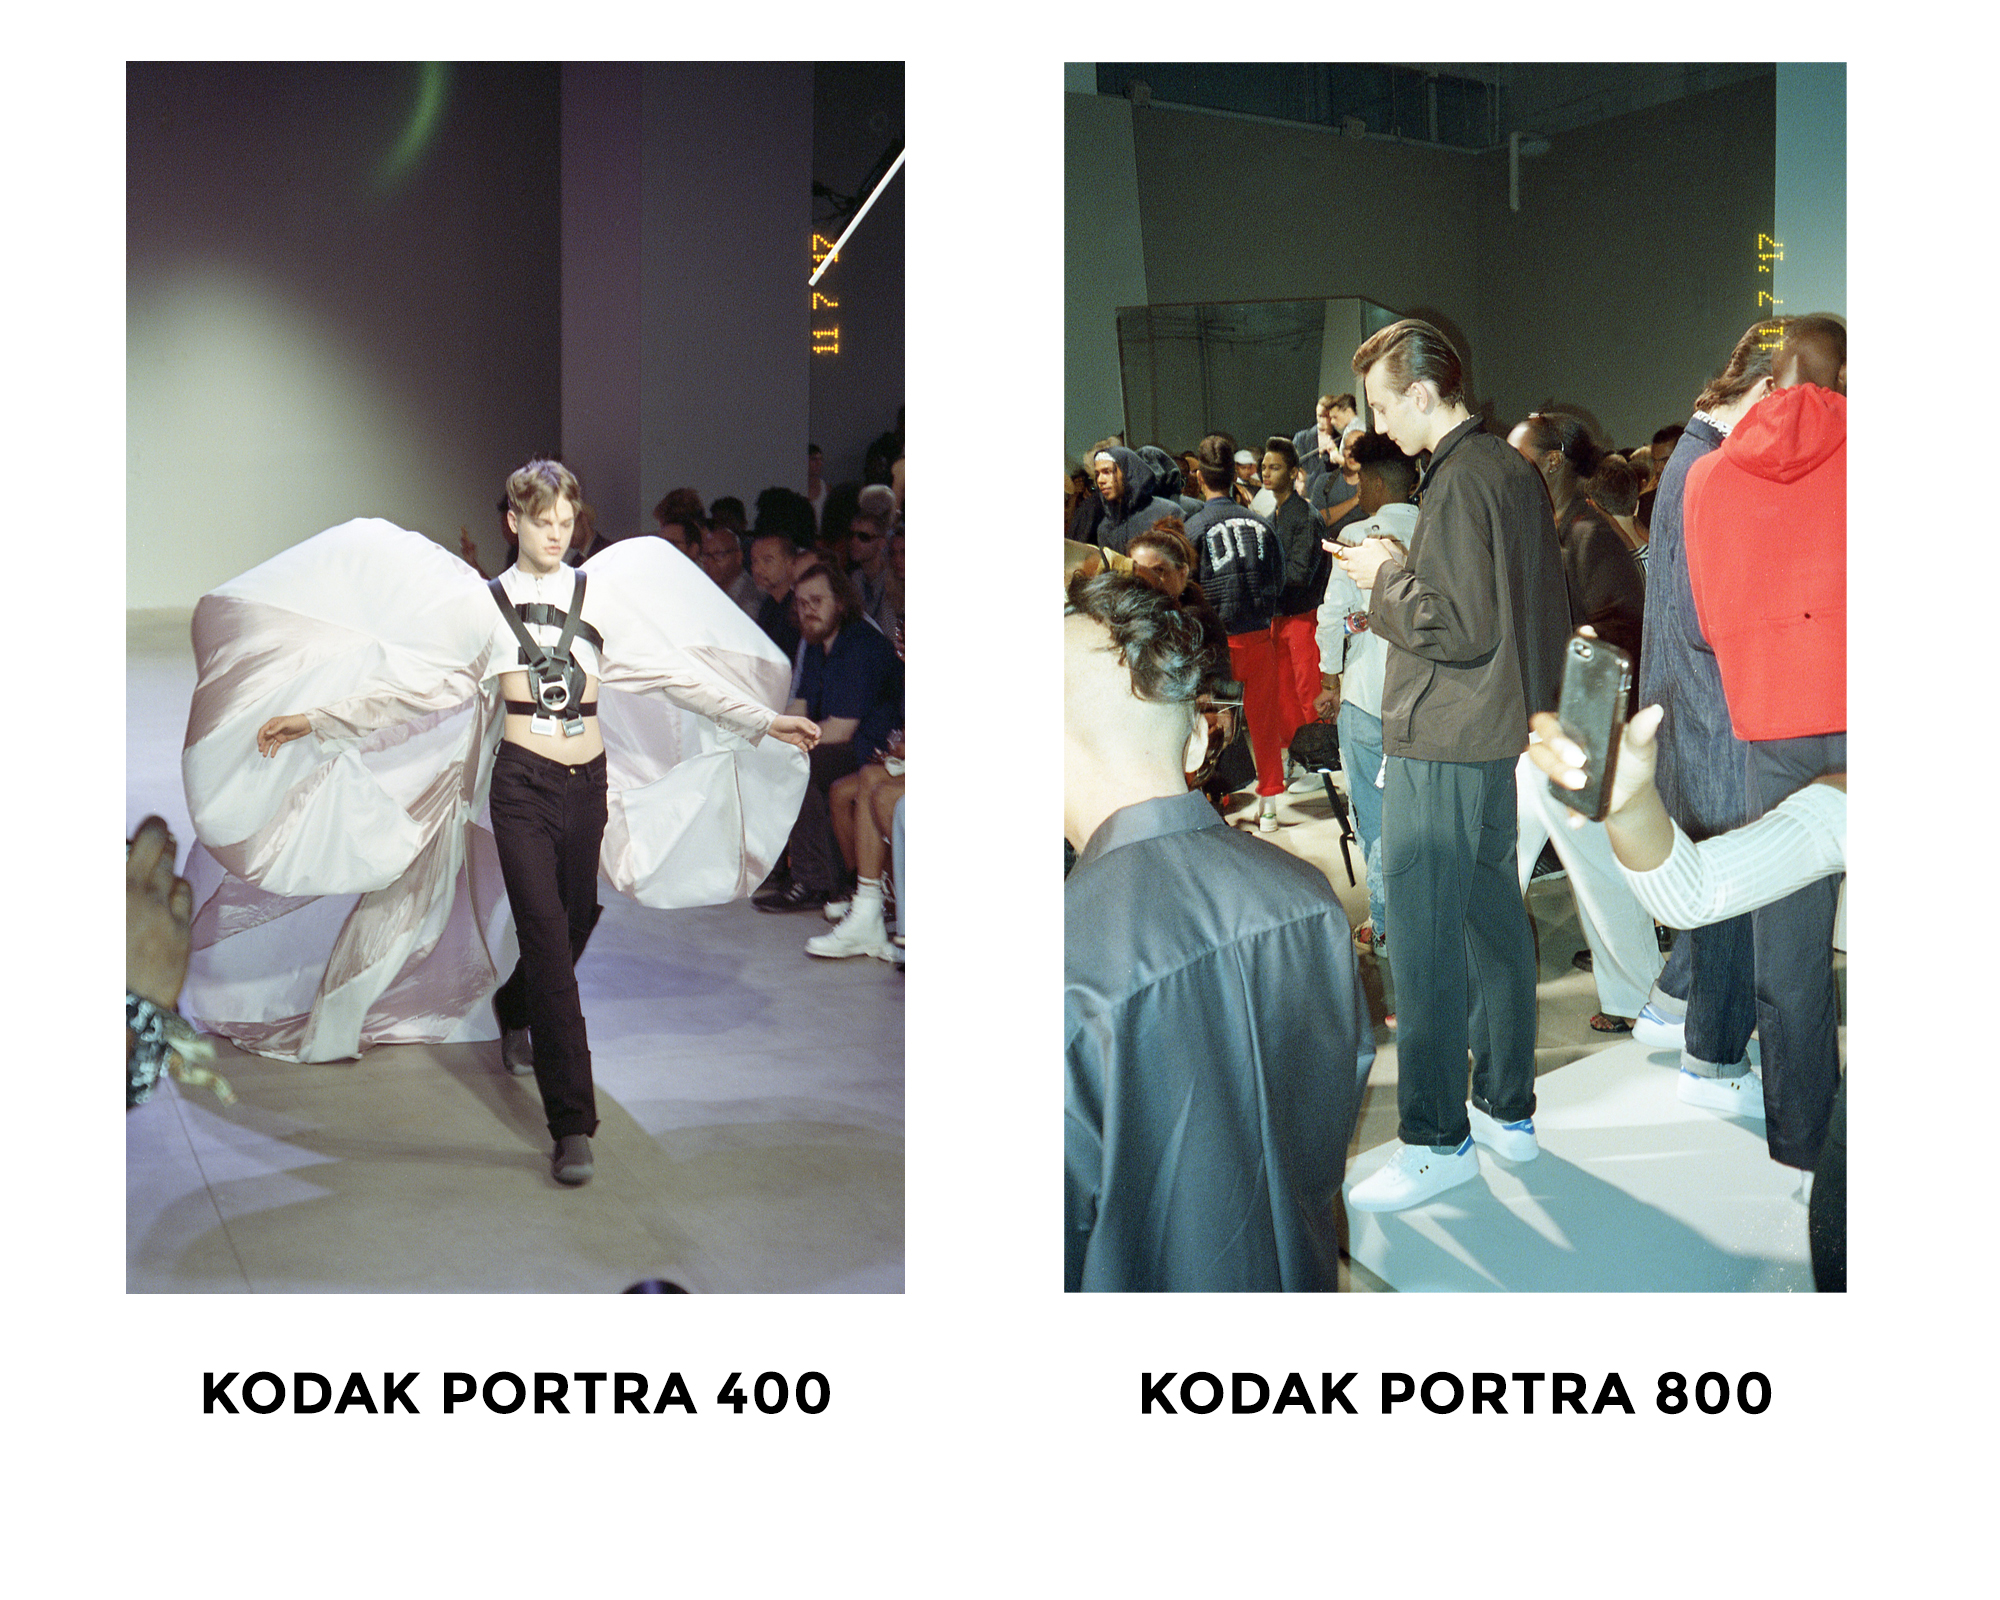 3 - Kodak Portra 400 vs. Kodak PortrA 800 - FILTERGRADE BLOG